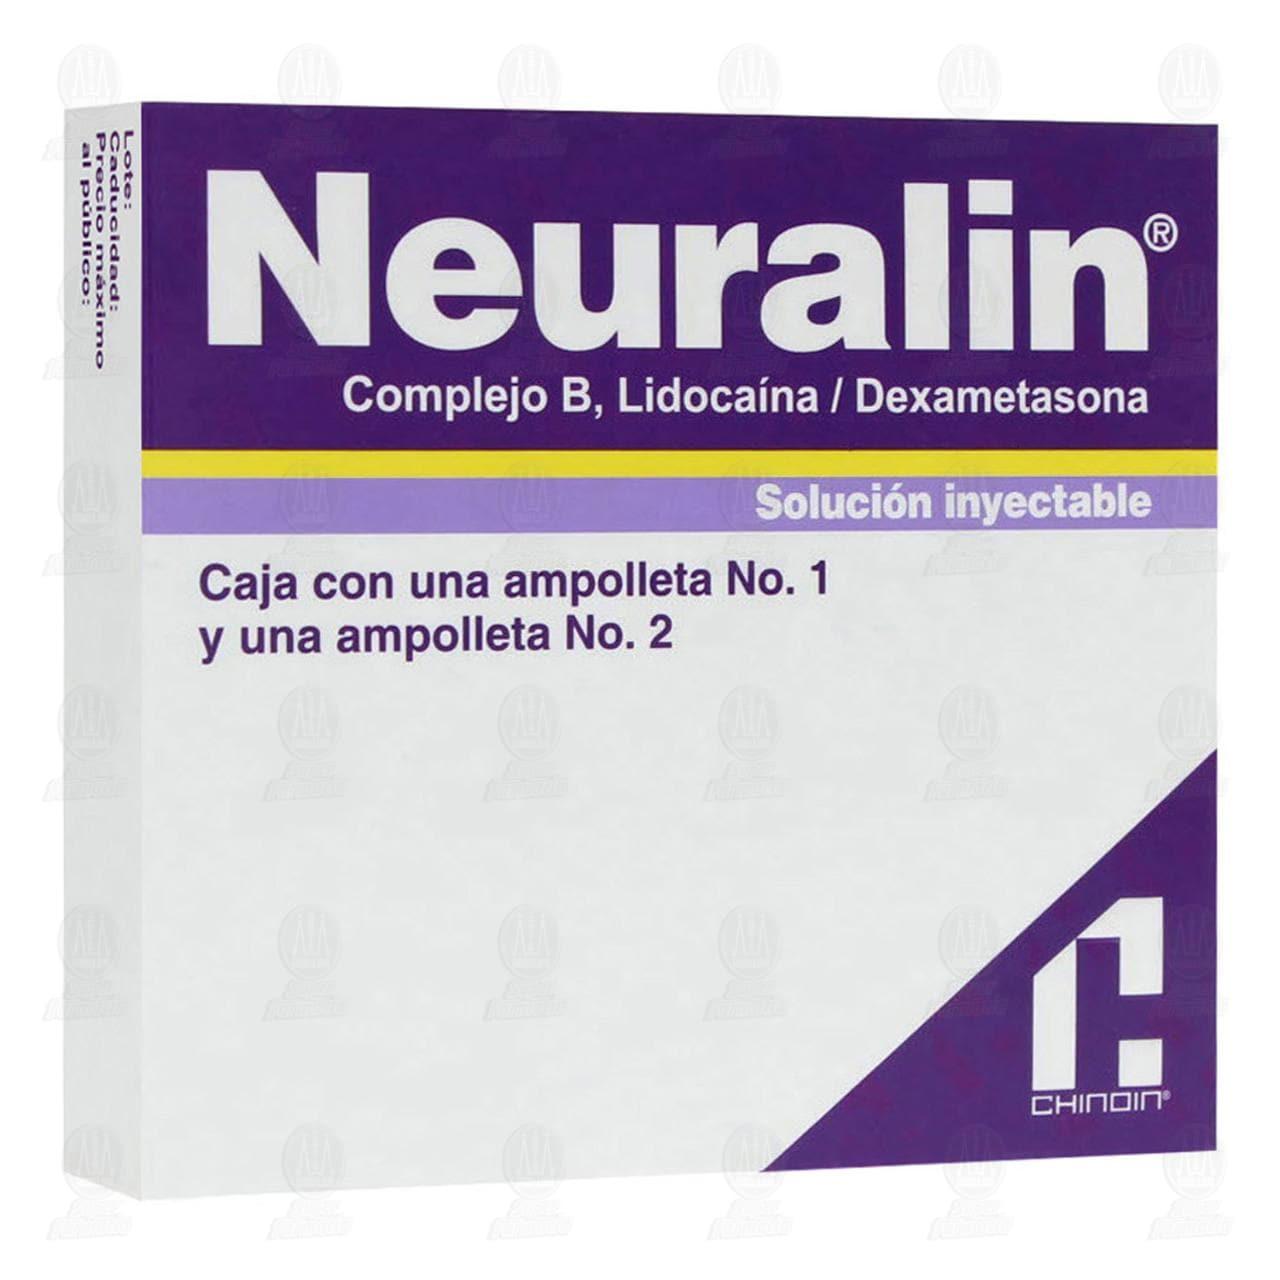 Comprar Neuralin 1ml/2ml 2 Ampolletas en Farmacias Guadalajara